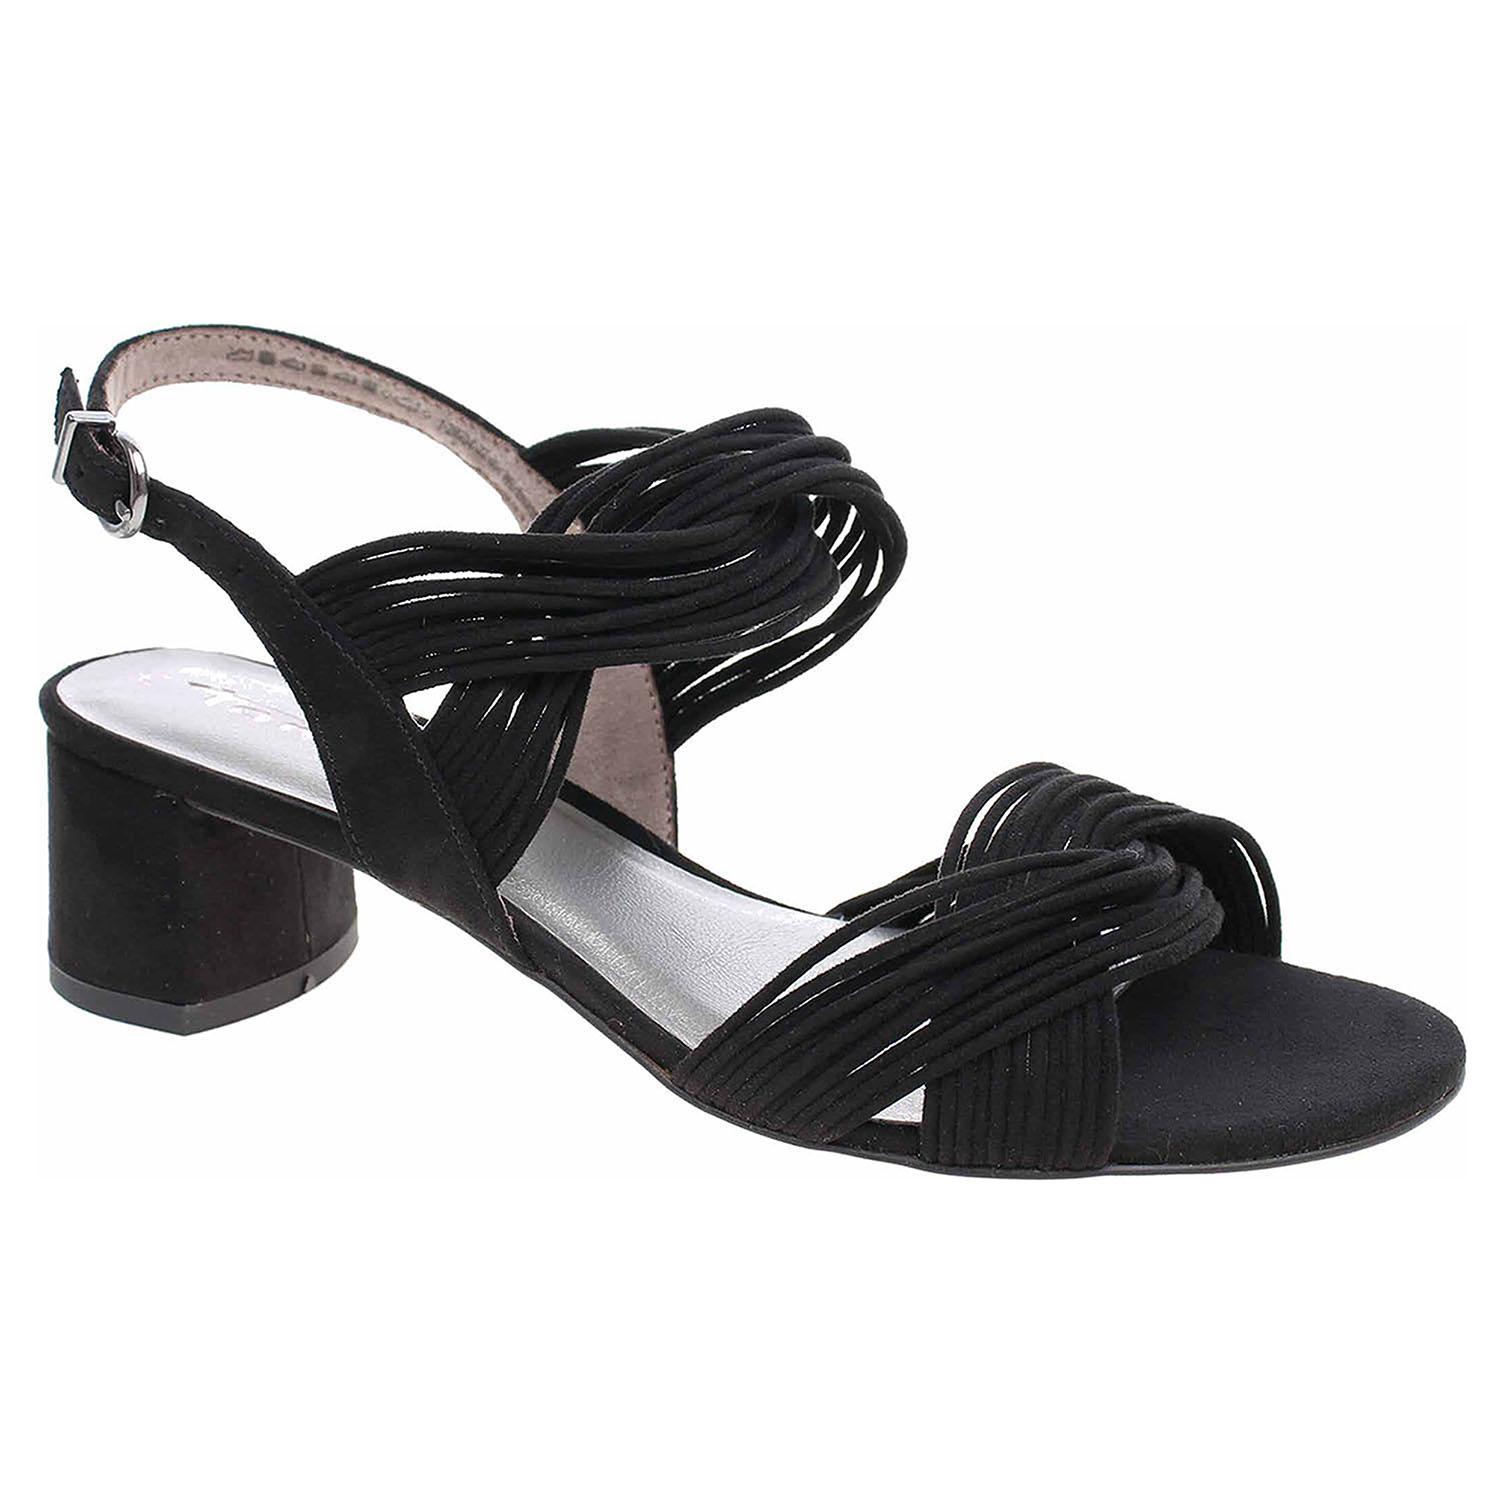 Dámská společenská obuv Tamaris 1-28204-22 black suede 1-1-28204-22 004 39